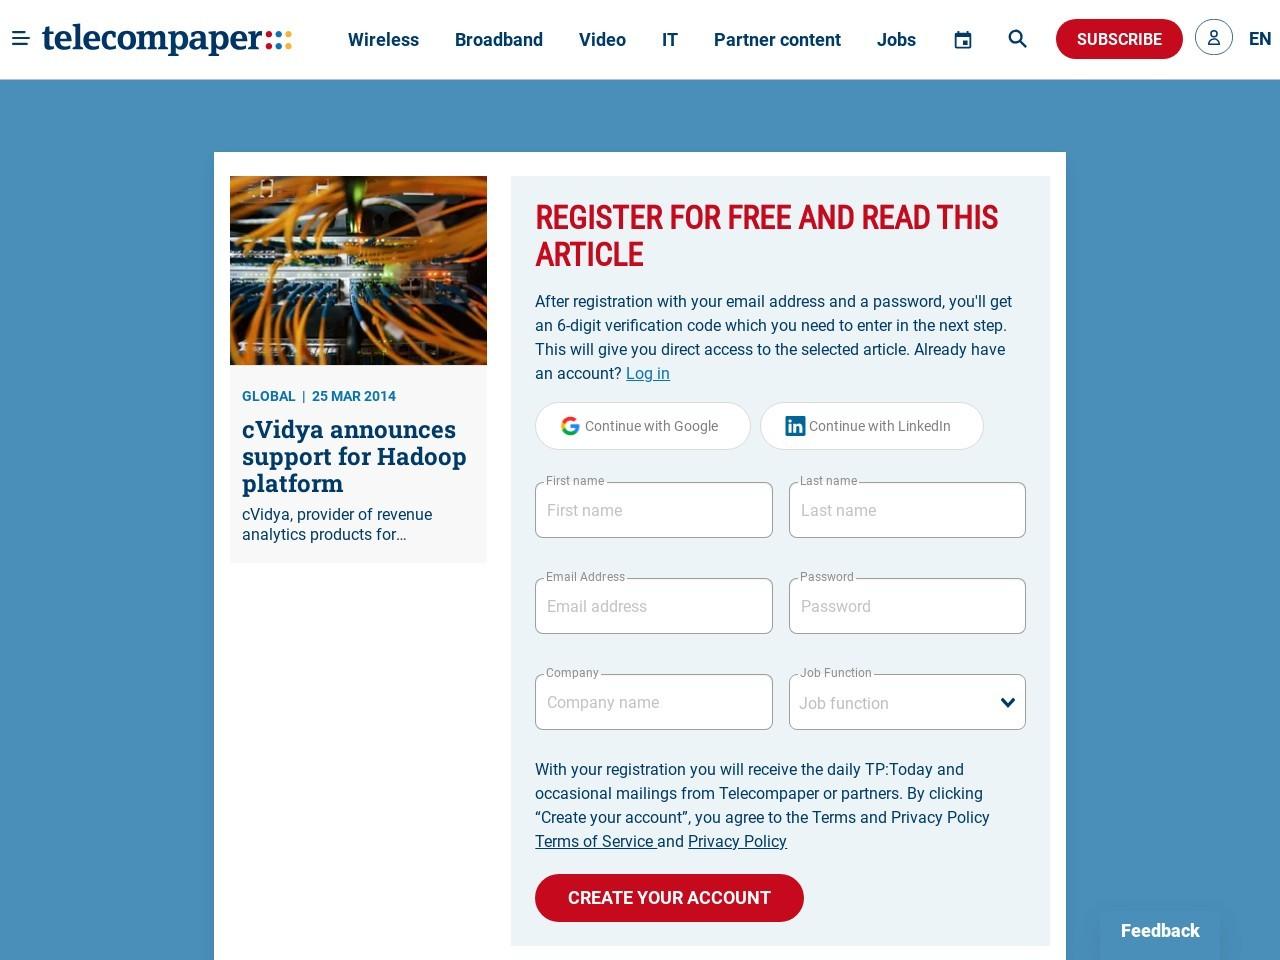 cVidya announces support for Hadoop platform